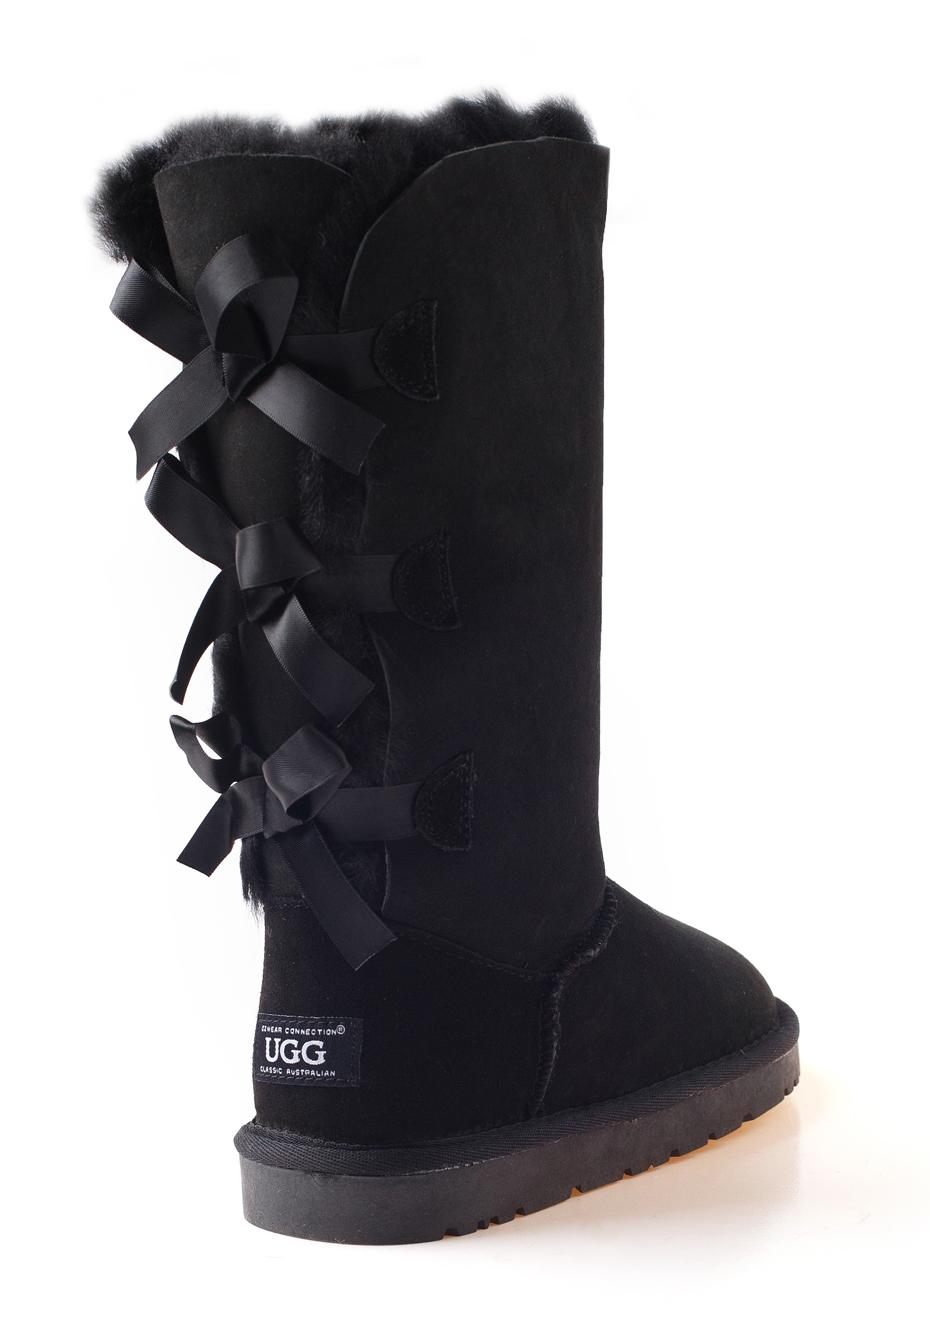 Ozwear - Ugg Three Ribbon Boots Discontinued - Black - Ozwear Uggs - Onceit